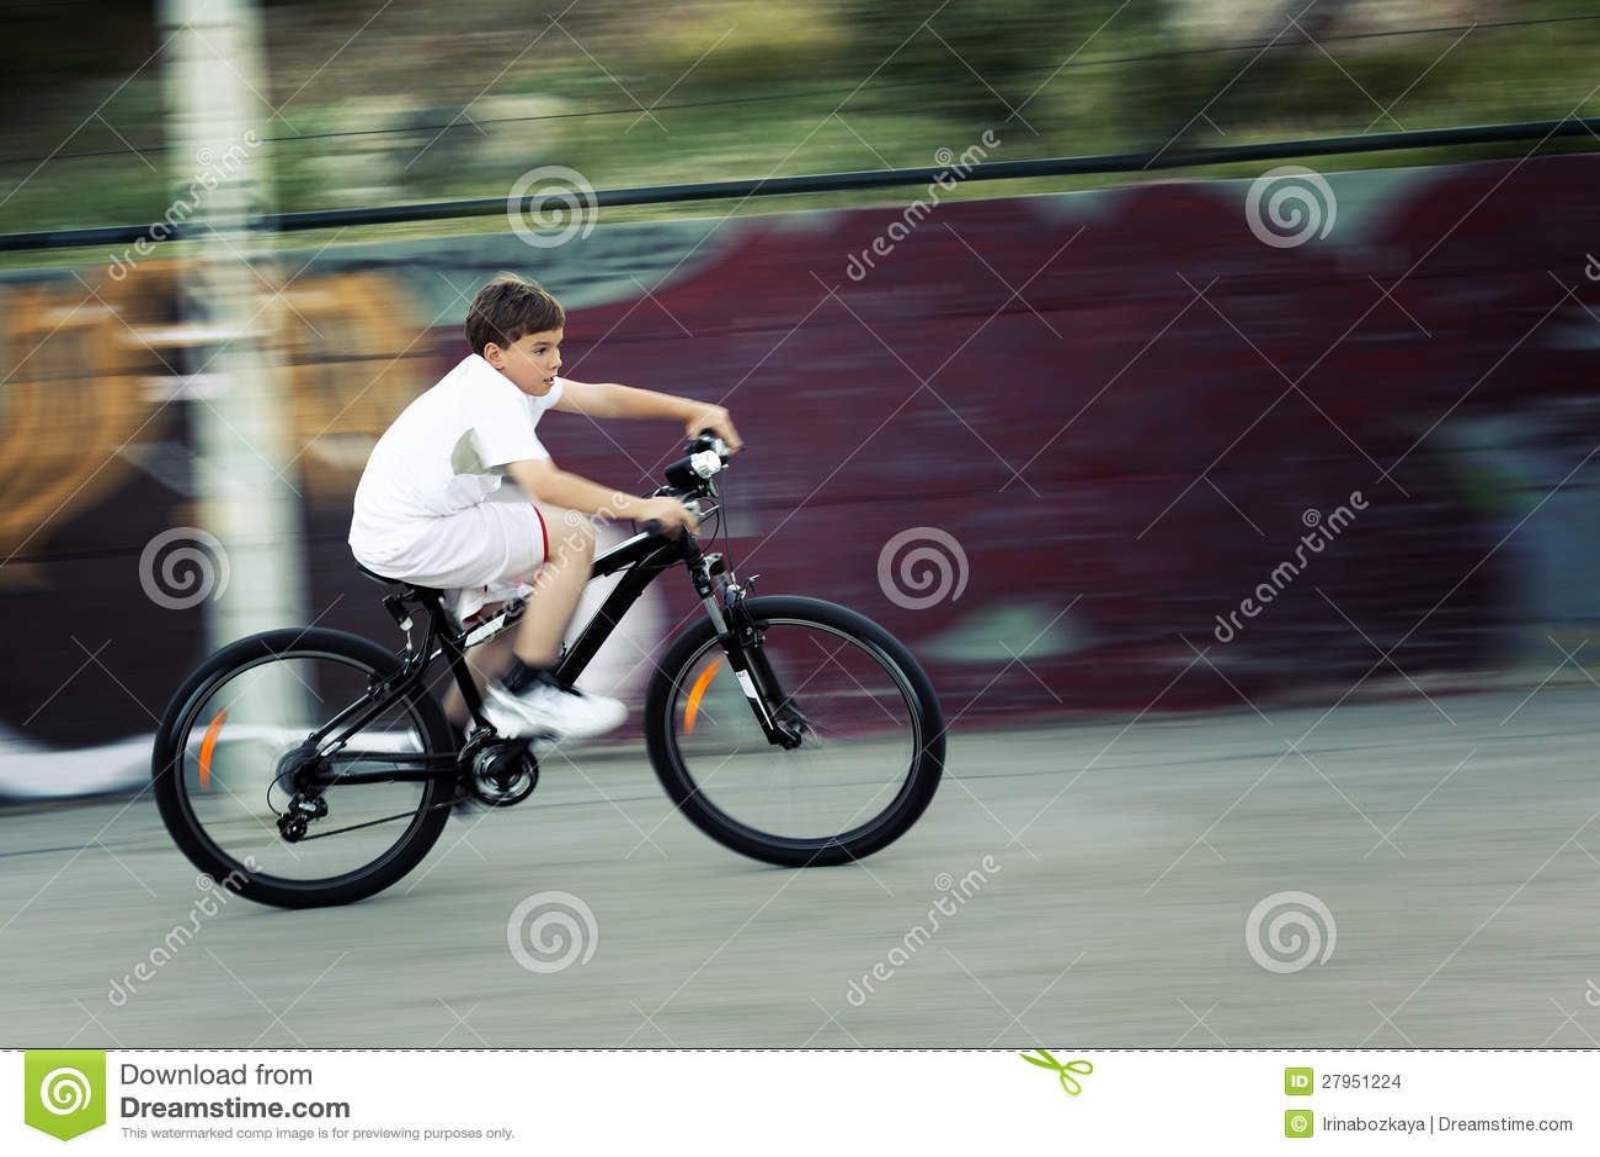 Fast bike ride stock photo  Image of exercise, moving - 27951224